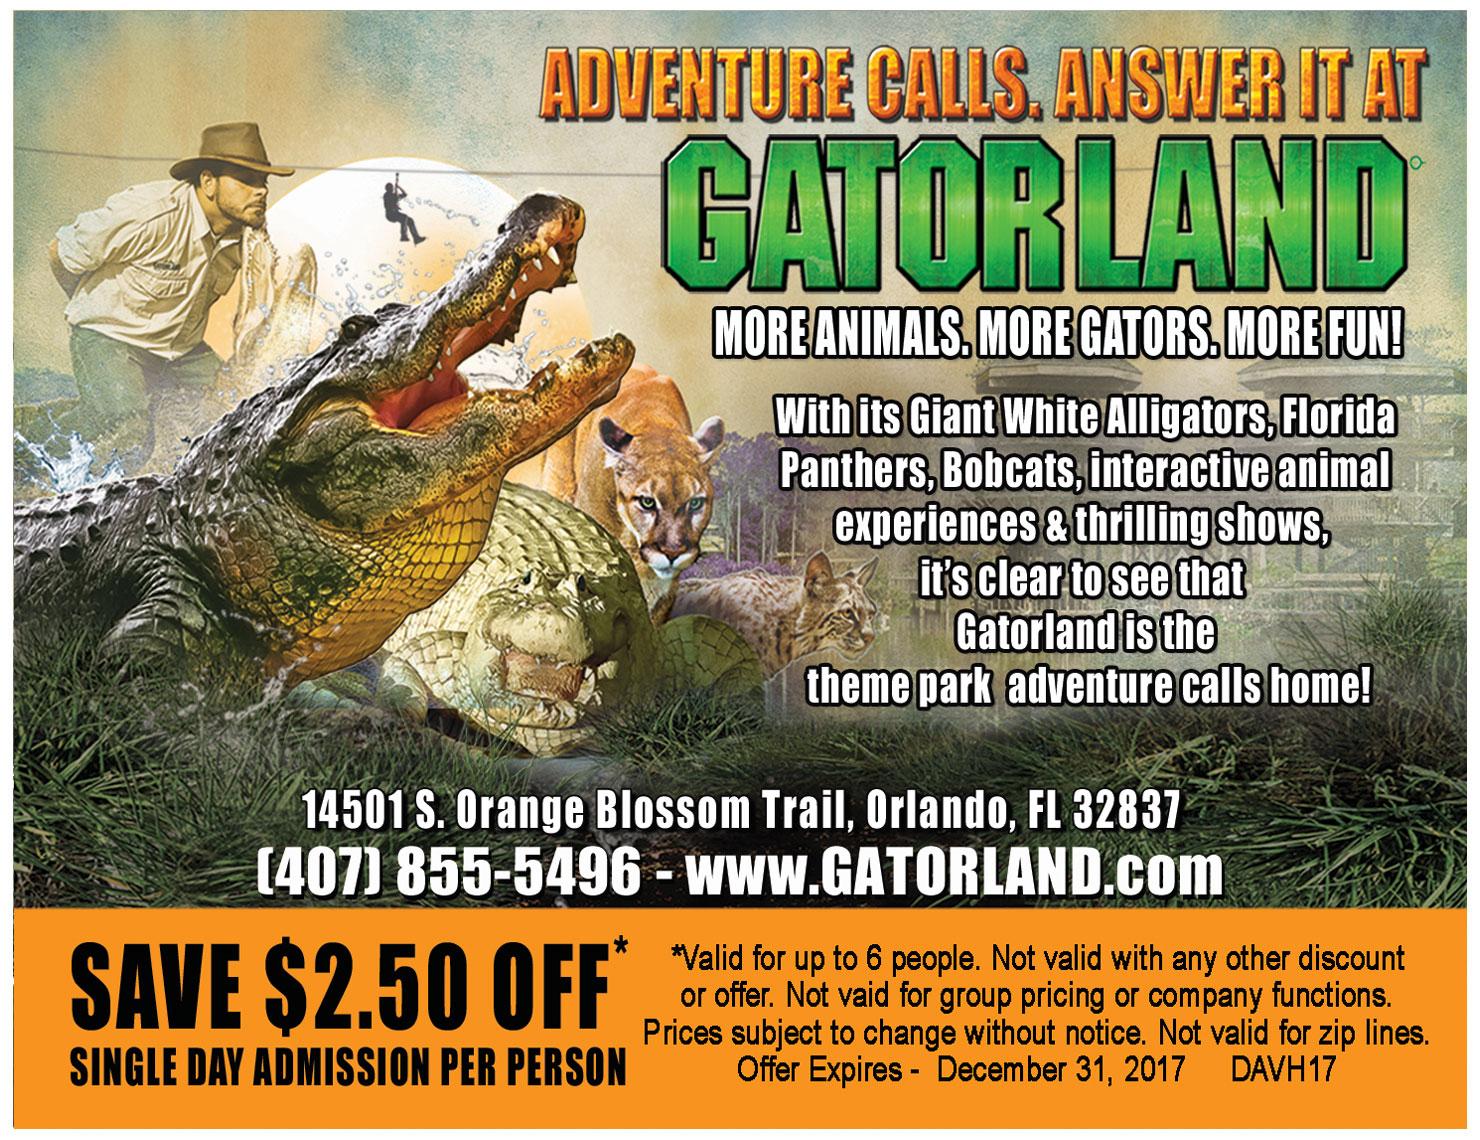 Gatorland orlando coupons